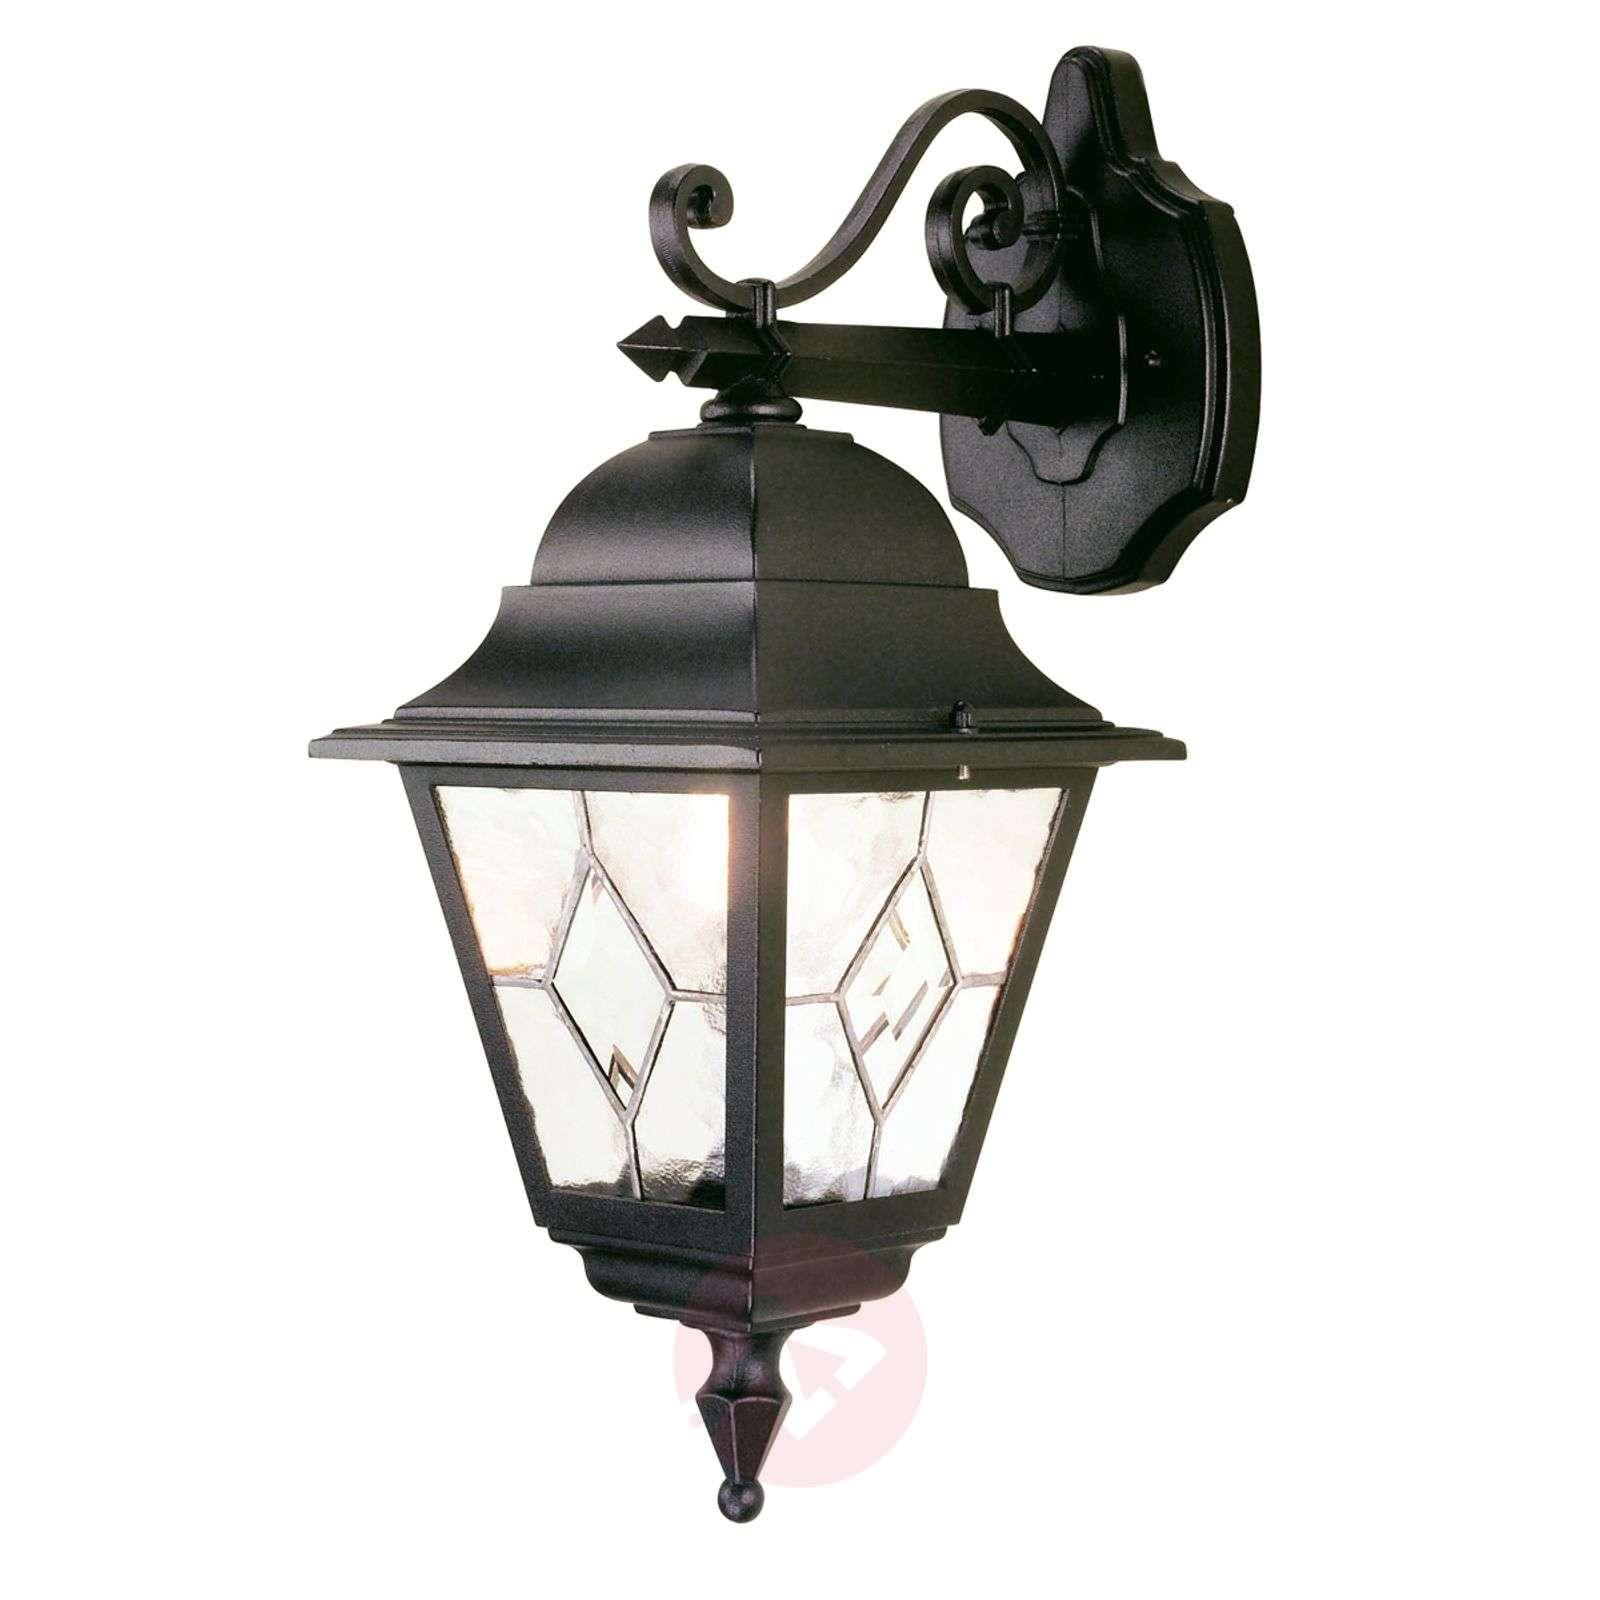 Hanging outdoor wall lamp Norfolk, lead glazed-3048424-01